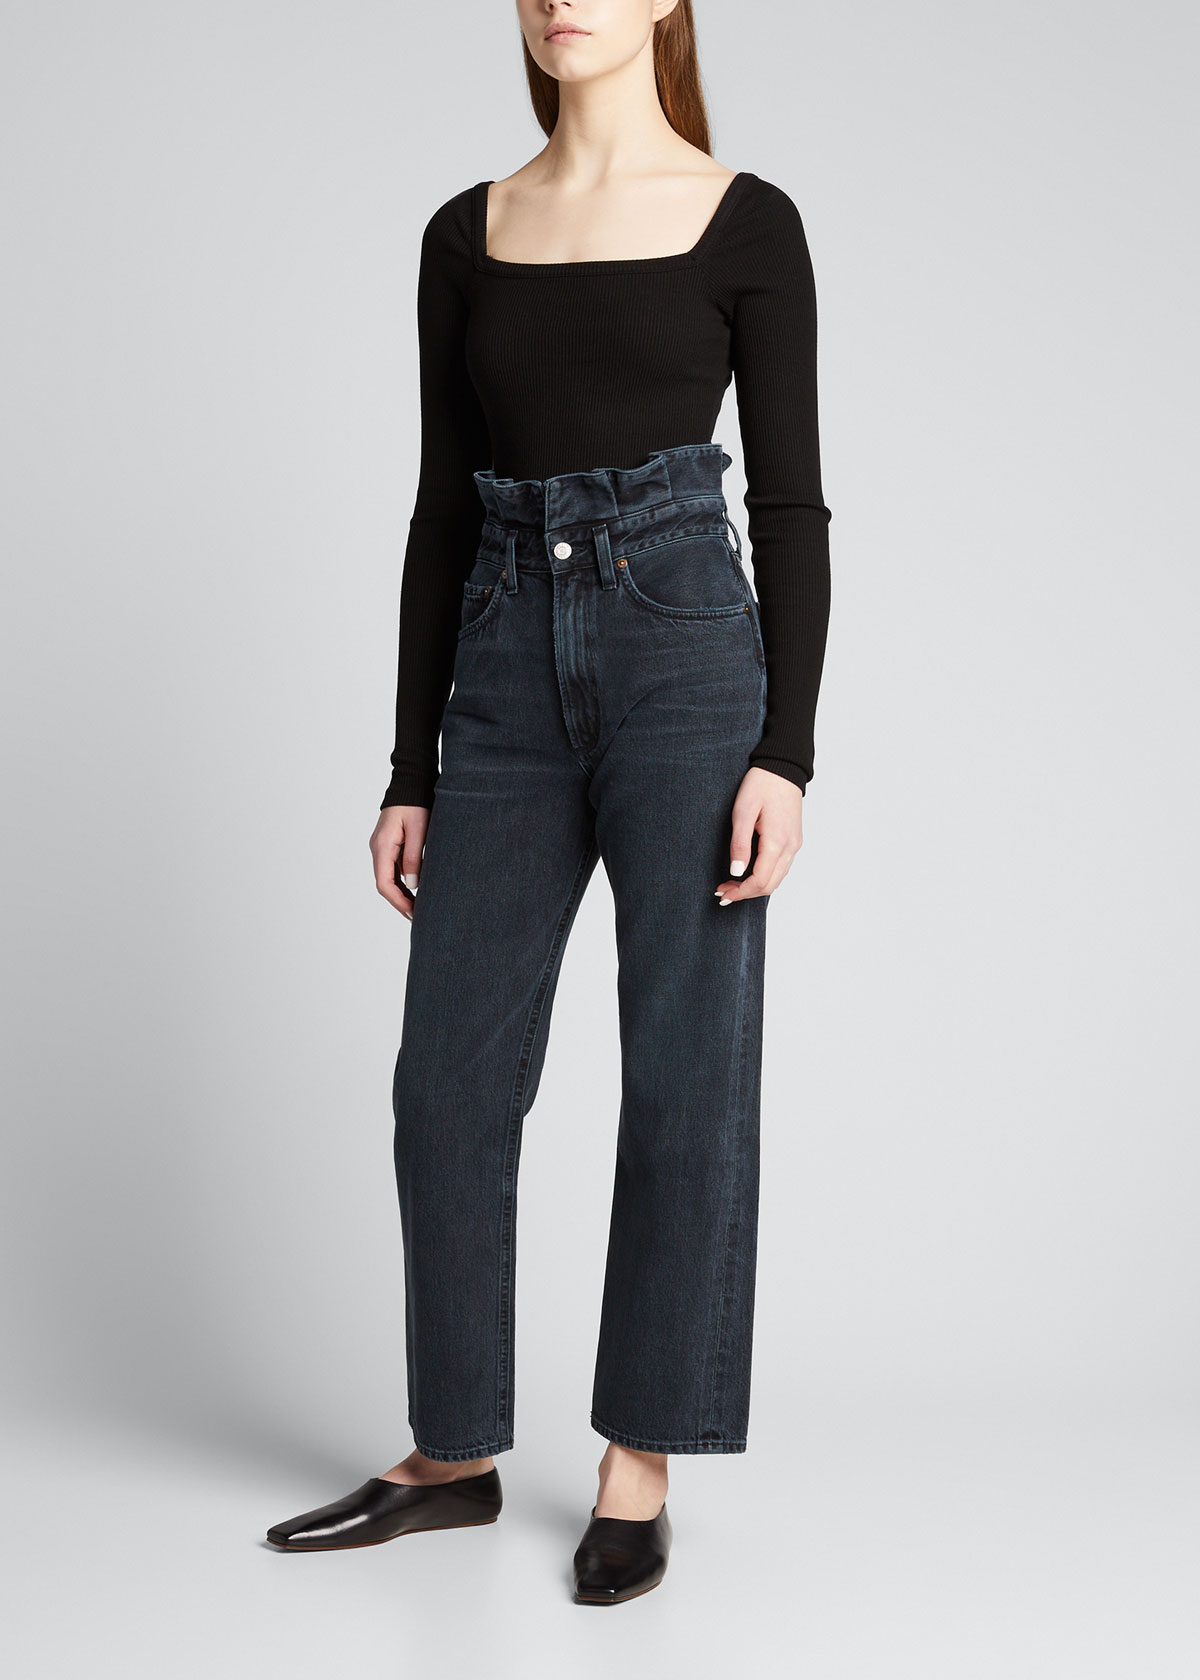 Agolde Clothing HANLEY SQUARE-NECK BODYSUIT